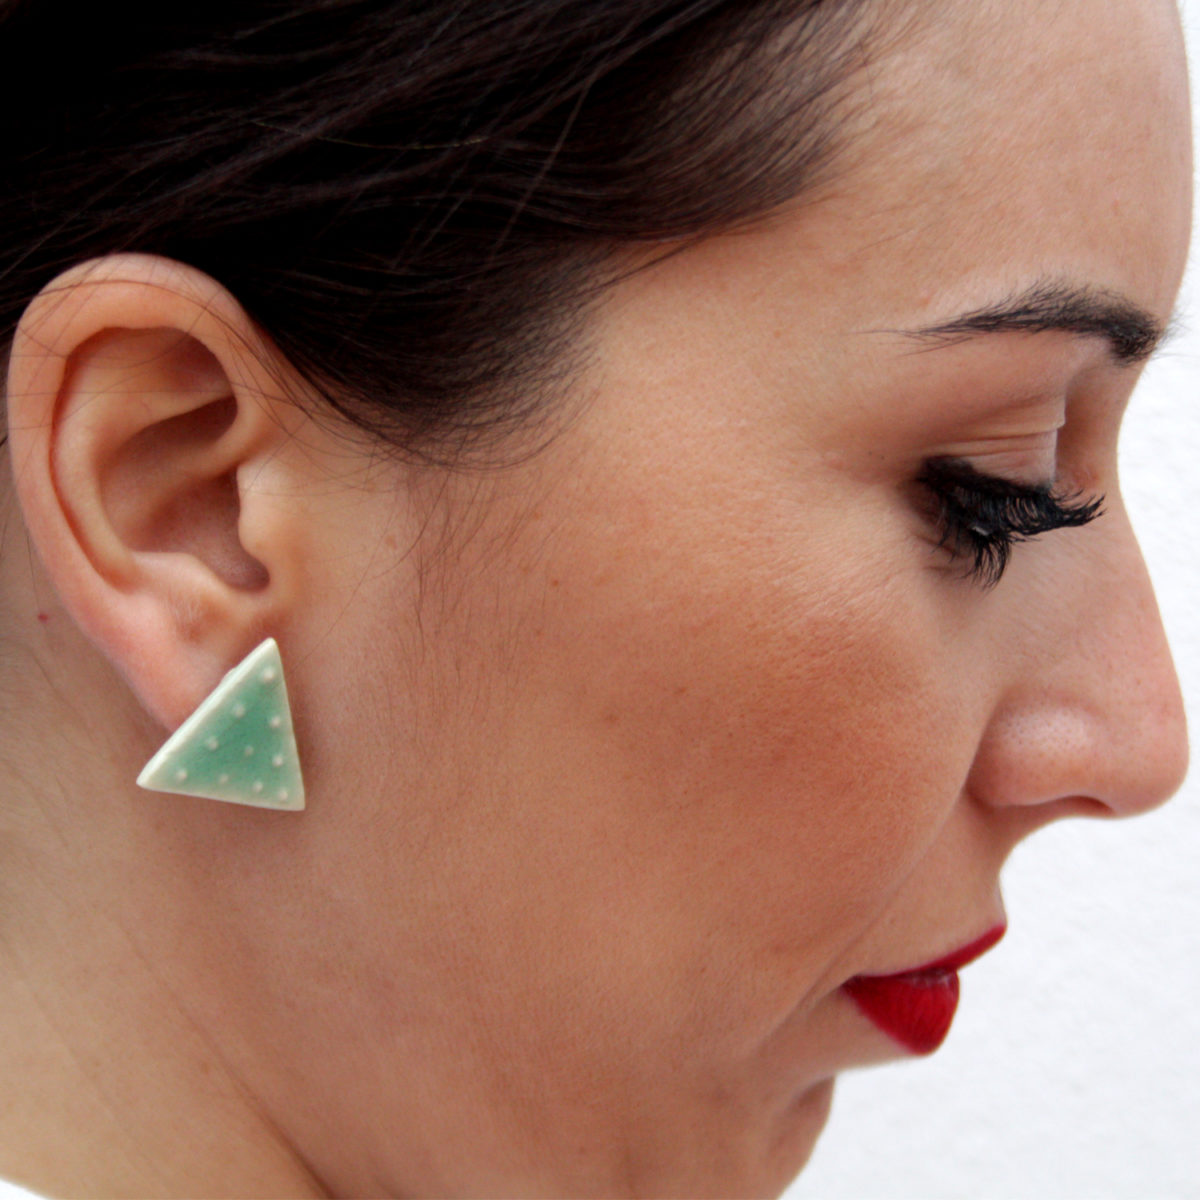 Pendientes de cerámica en triangulo minimalista Bowtery Manguilla verde menta con textura de lunares. Handmade ceramic earrings triangle minimalist mint green spotted texture